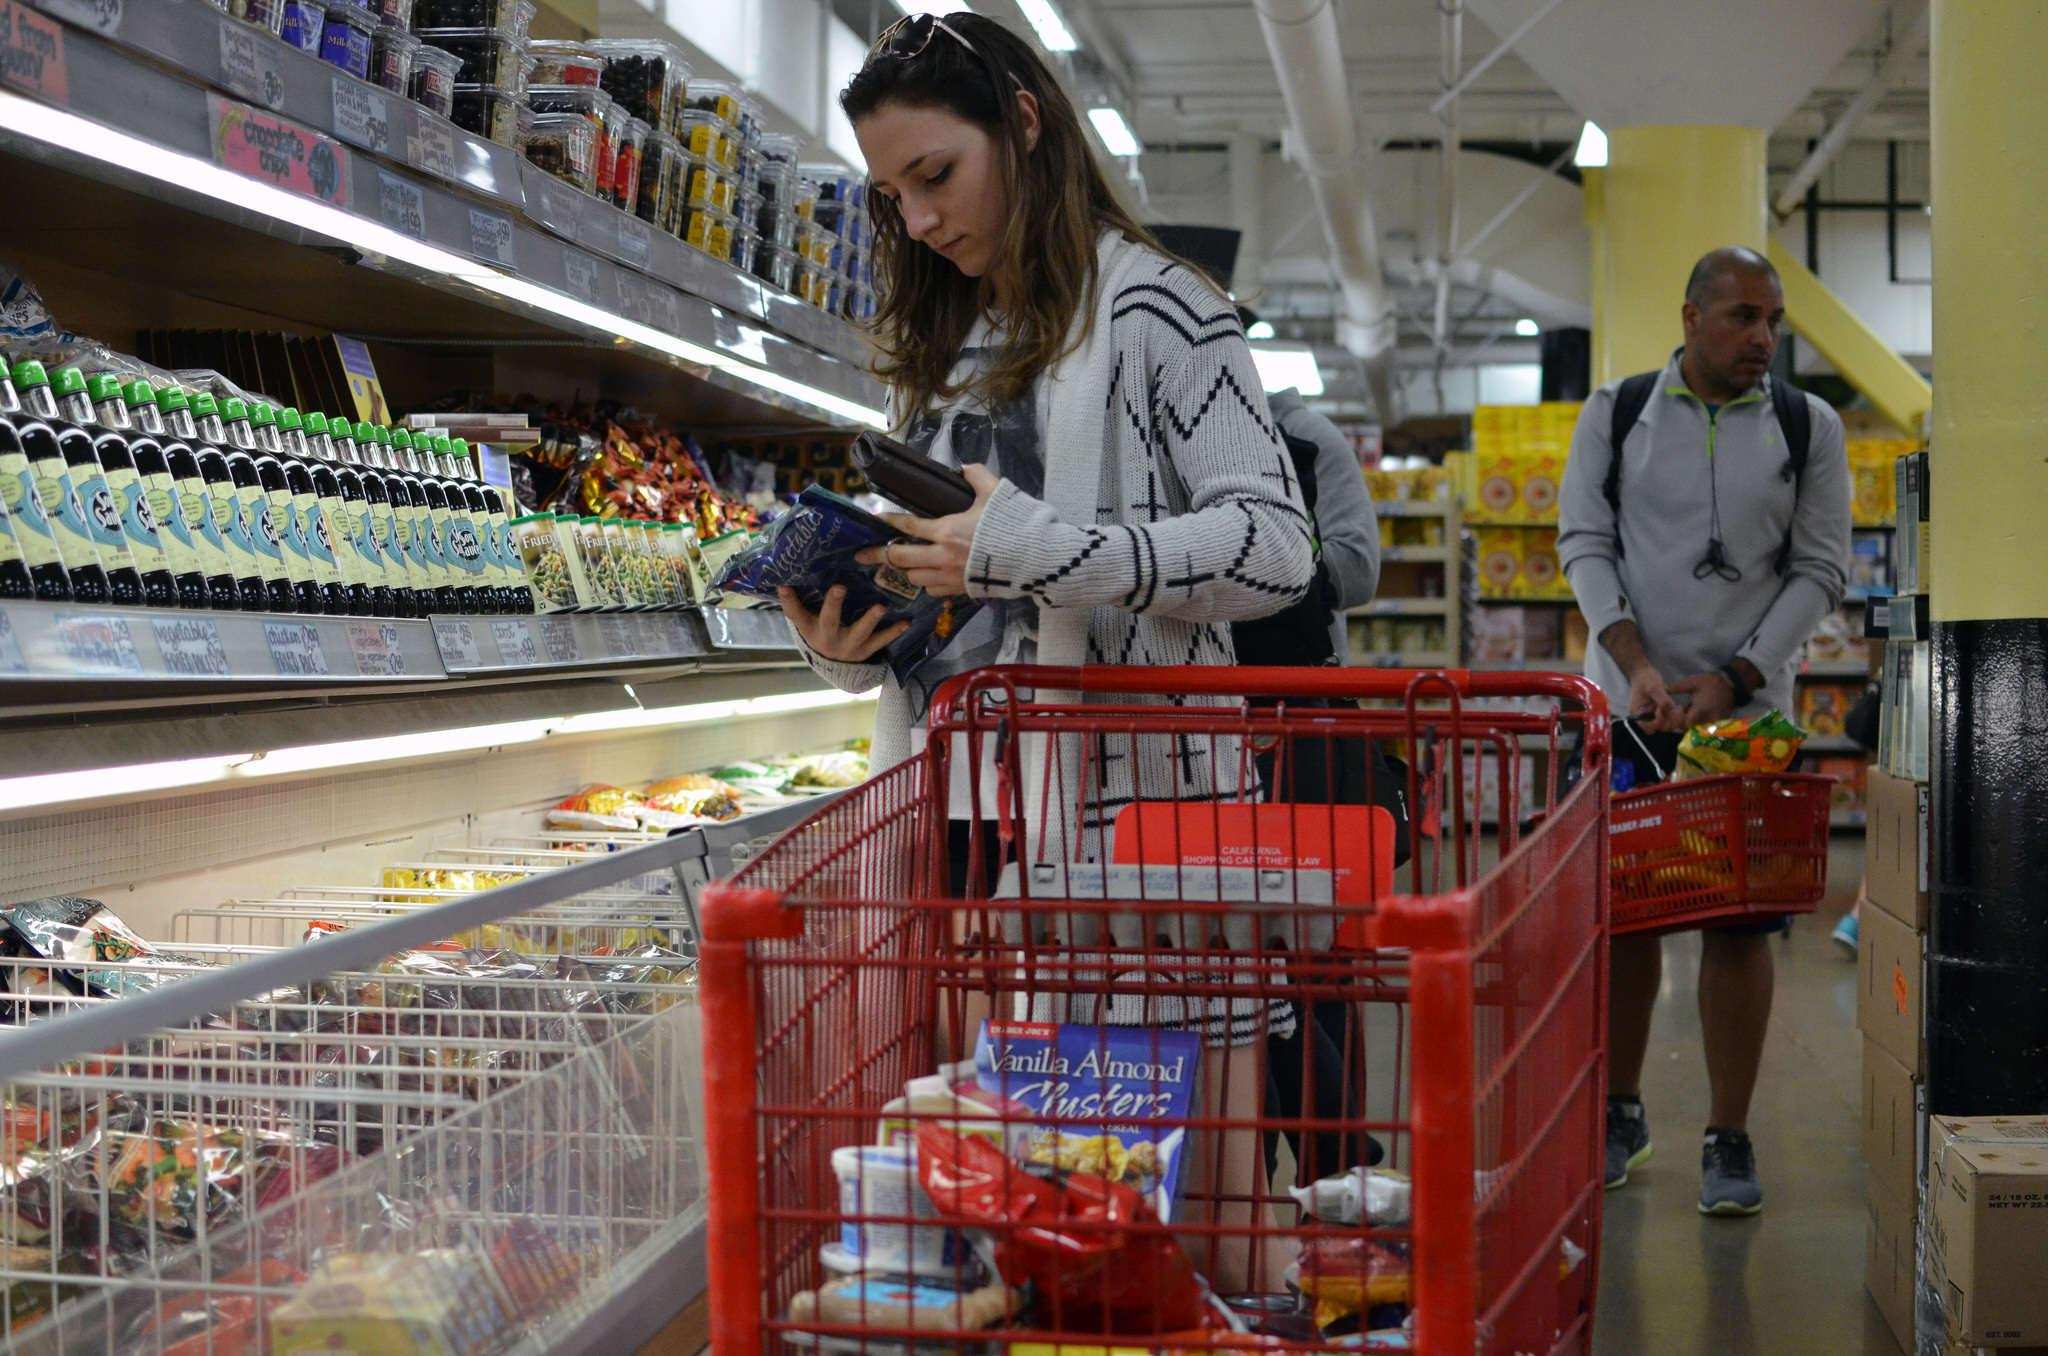 Marija Milutinavic does grocery shopping at Trader Joe's Sunday Feb, 1. (Photo by Hyunha Kim)